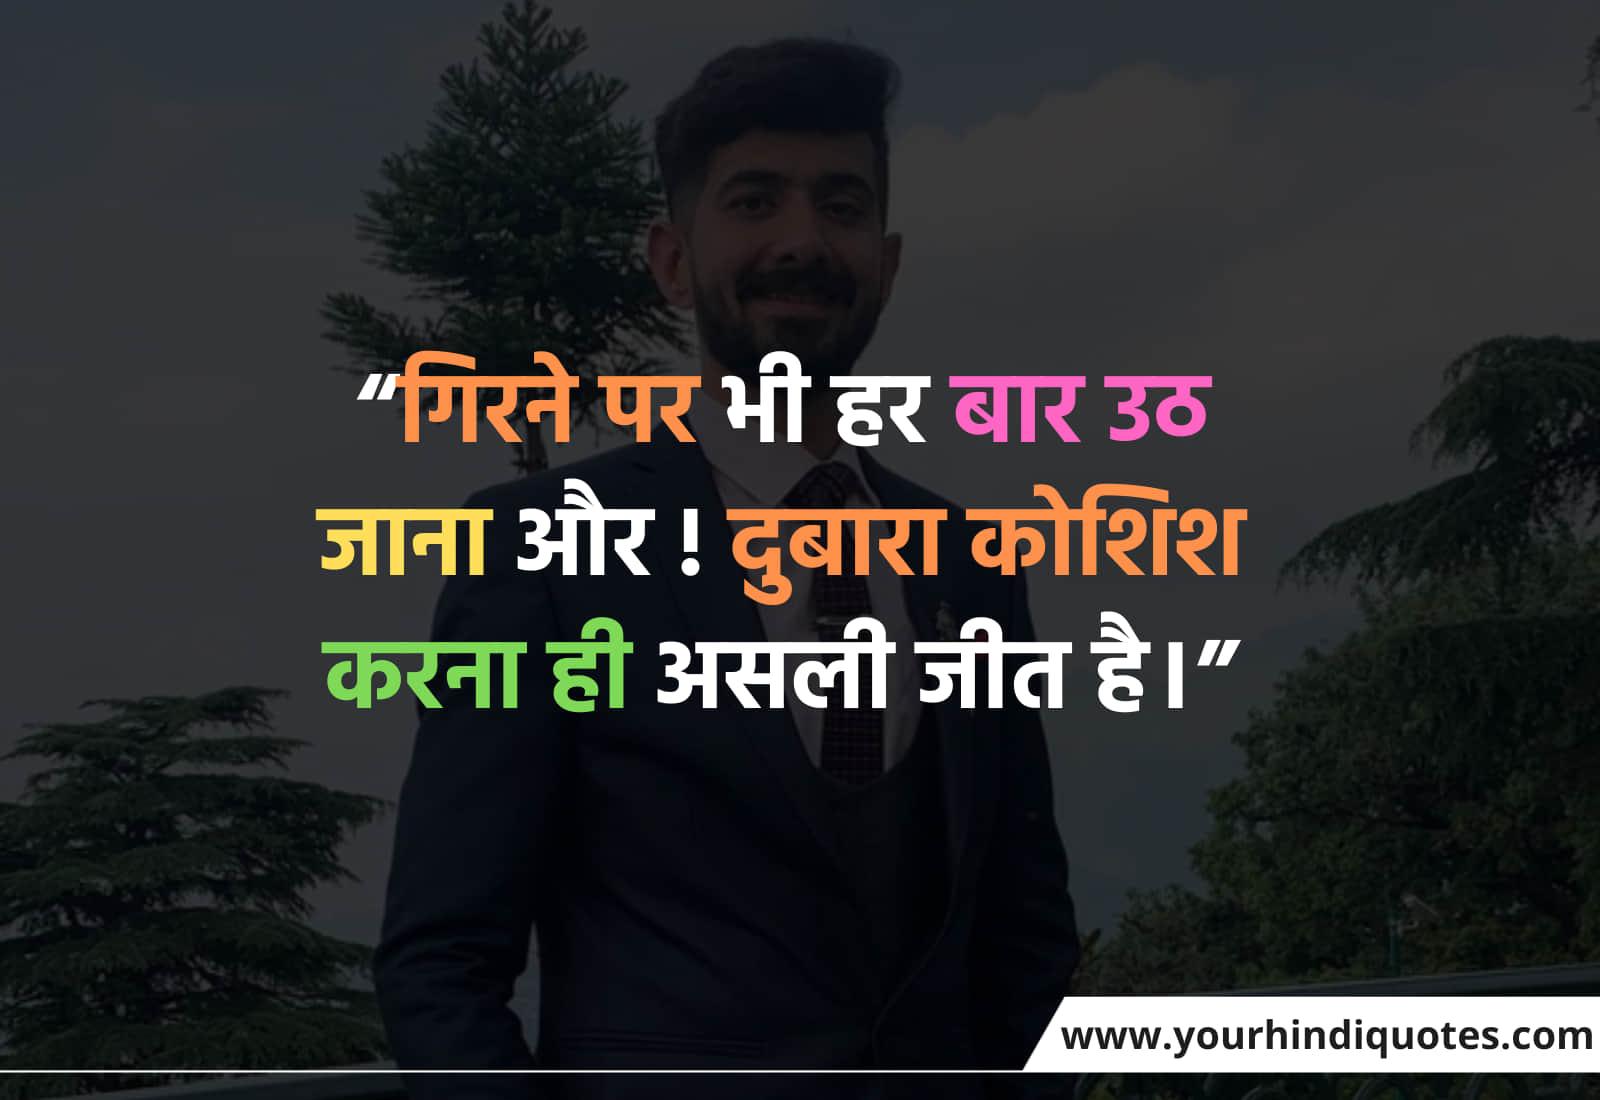 Inspiring Students Quotes In Hindi